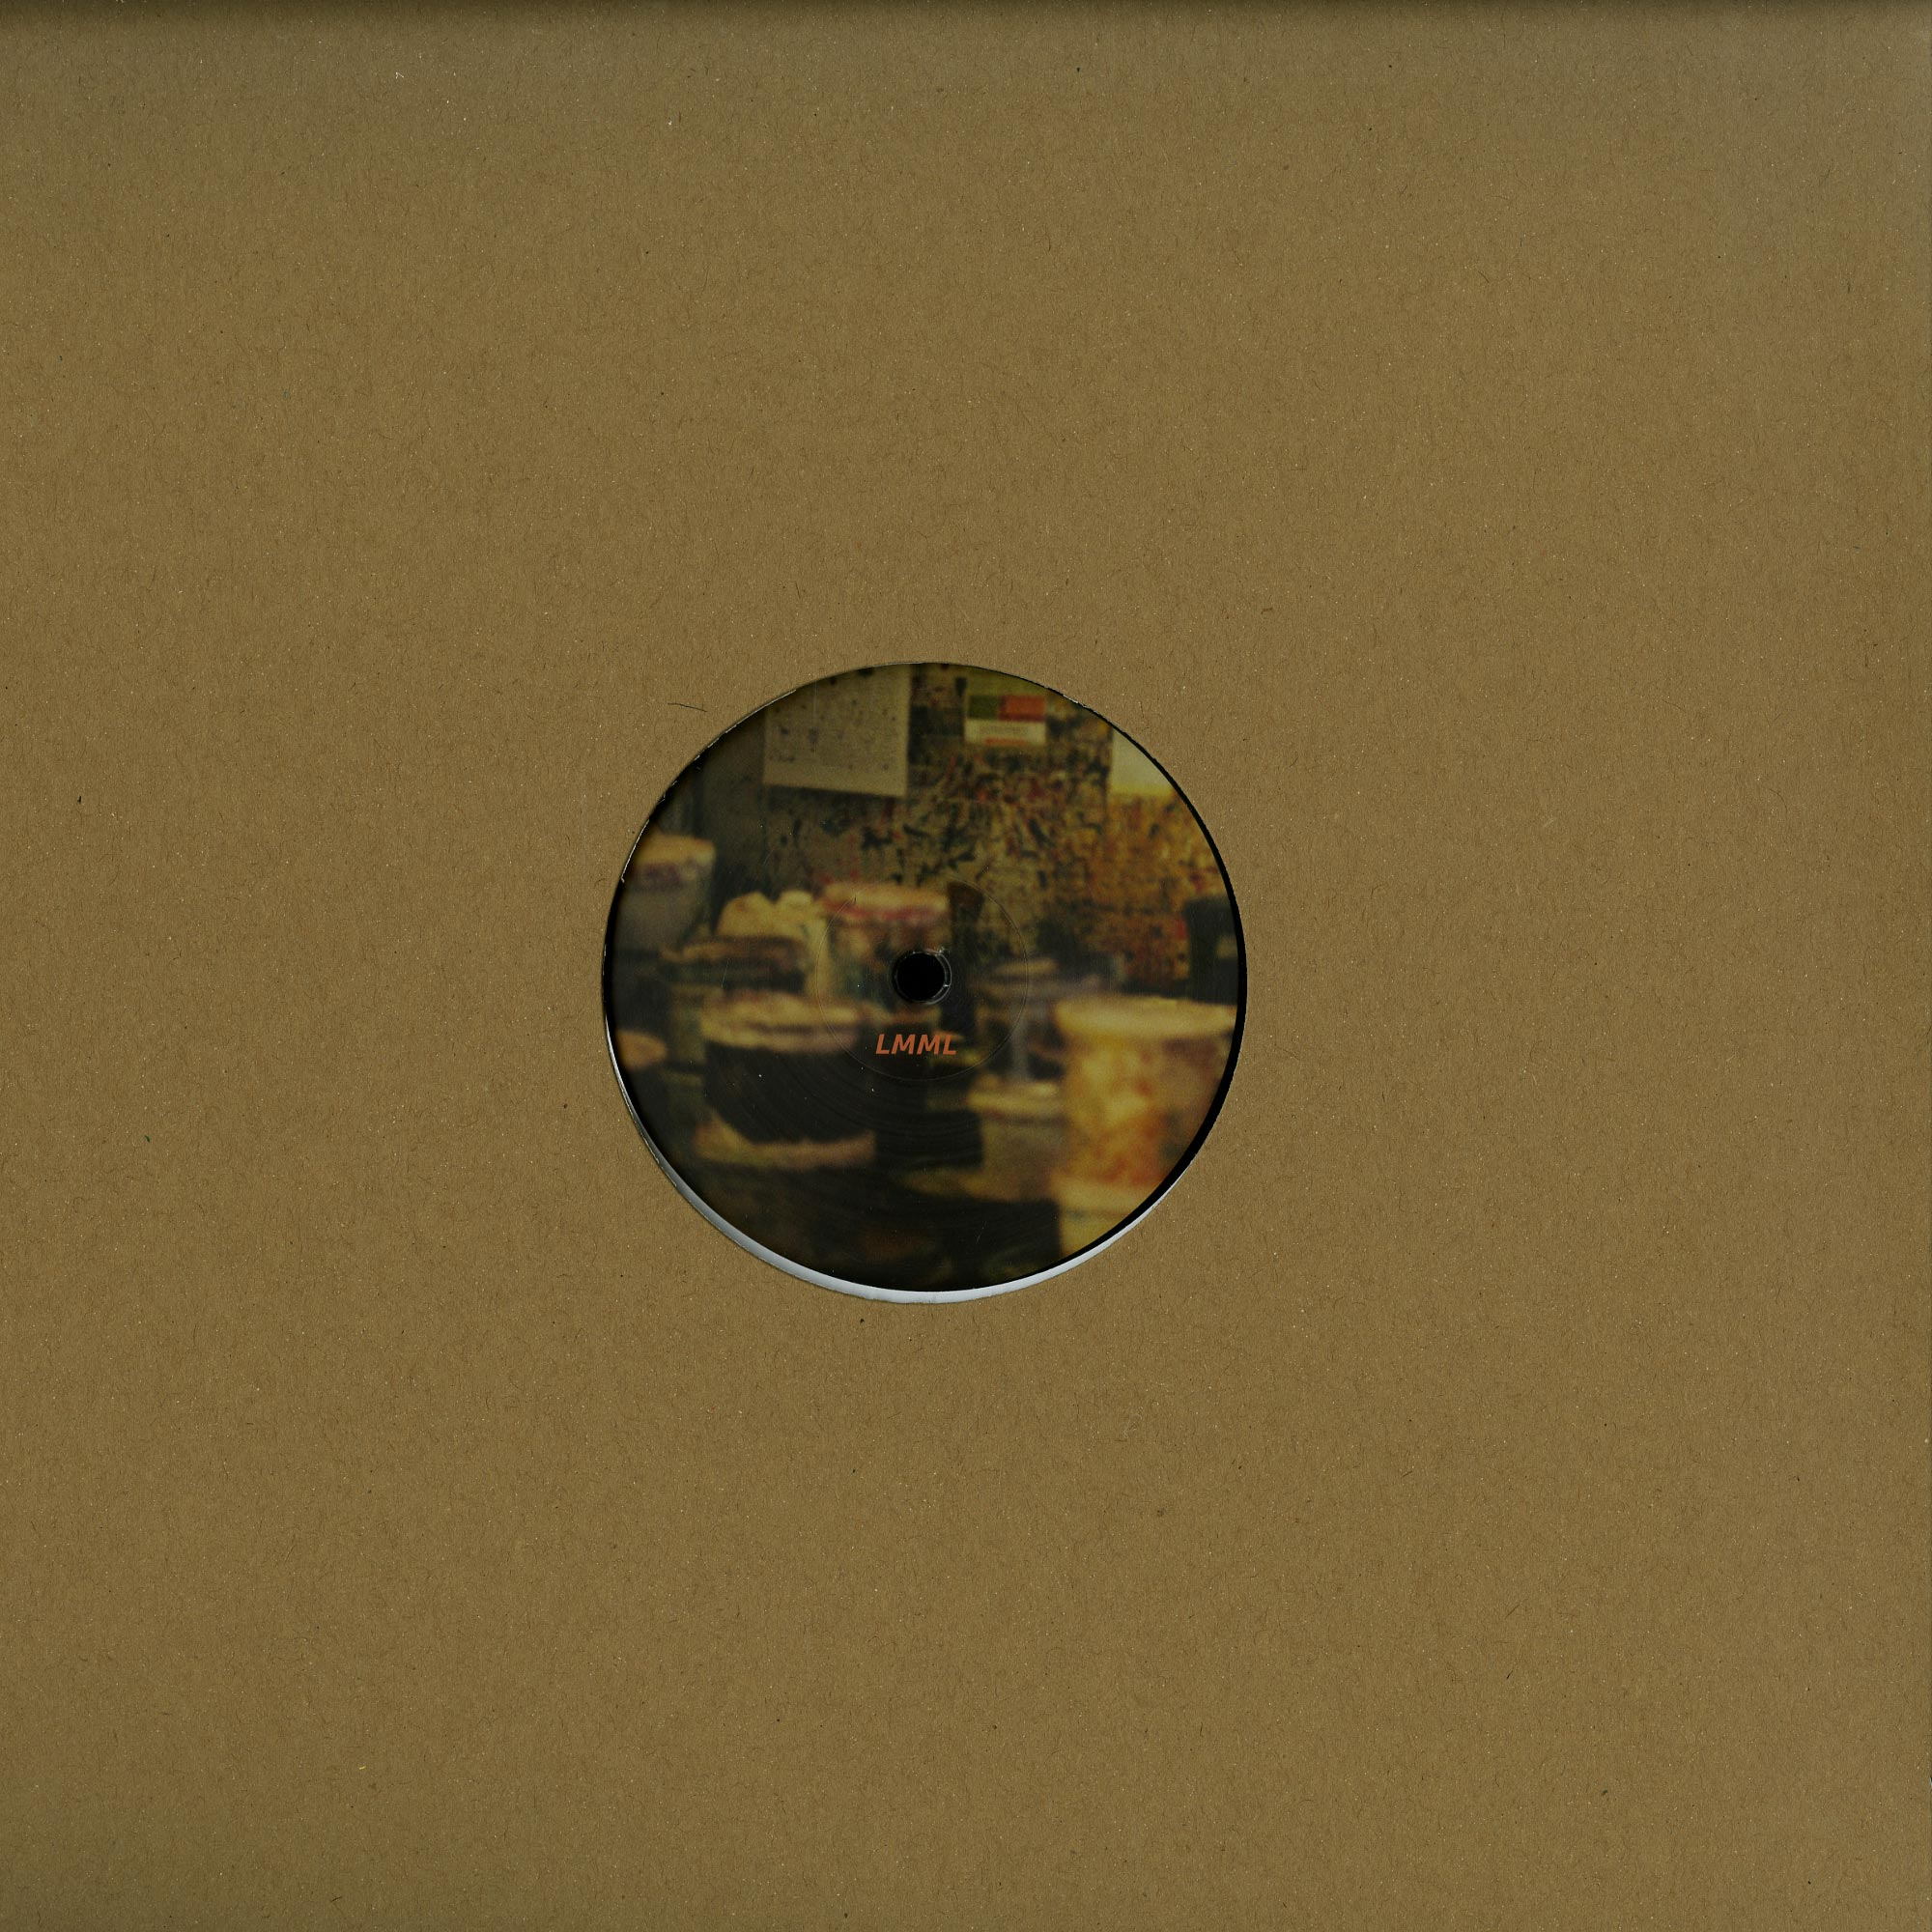 Enrico Mantini - DO SOMETHING EP